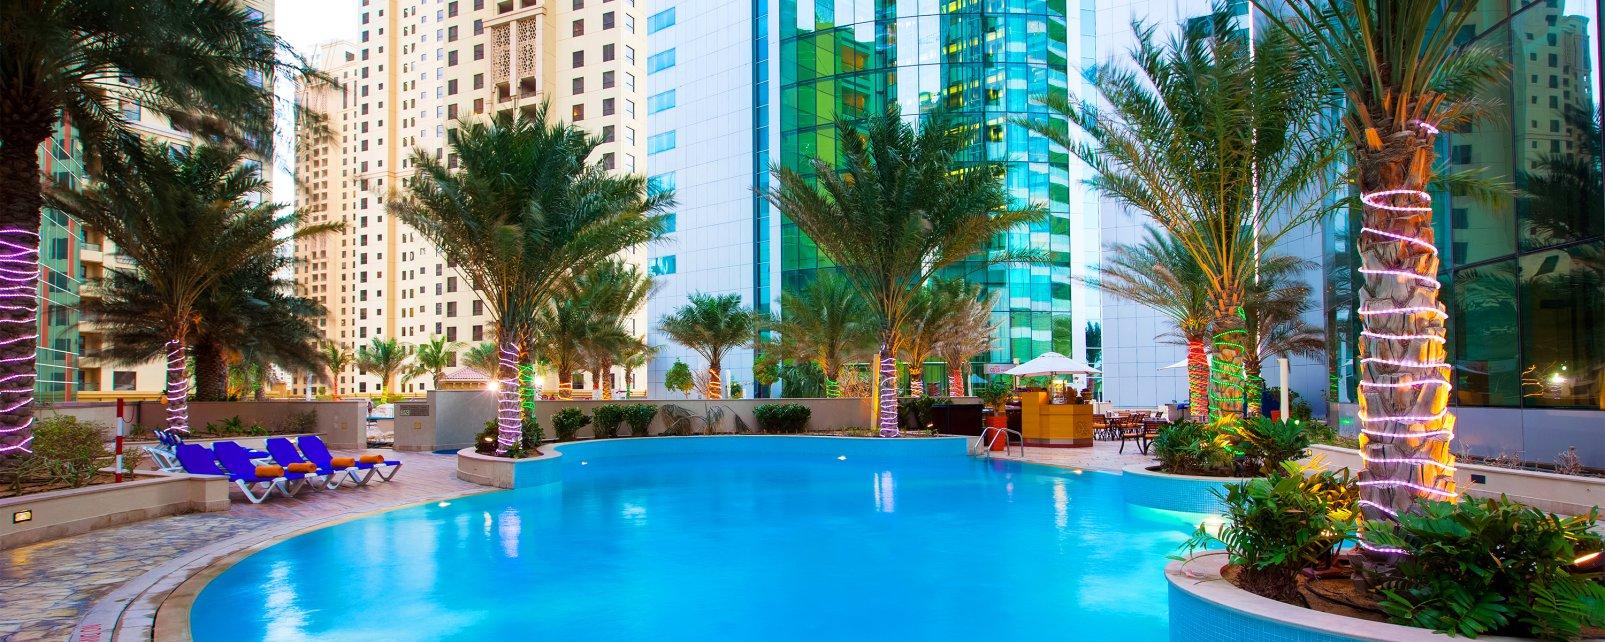 Hotel Oasis Beach